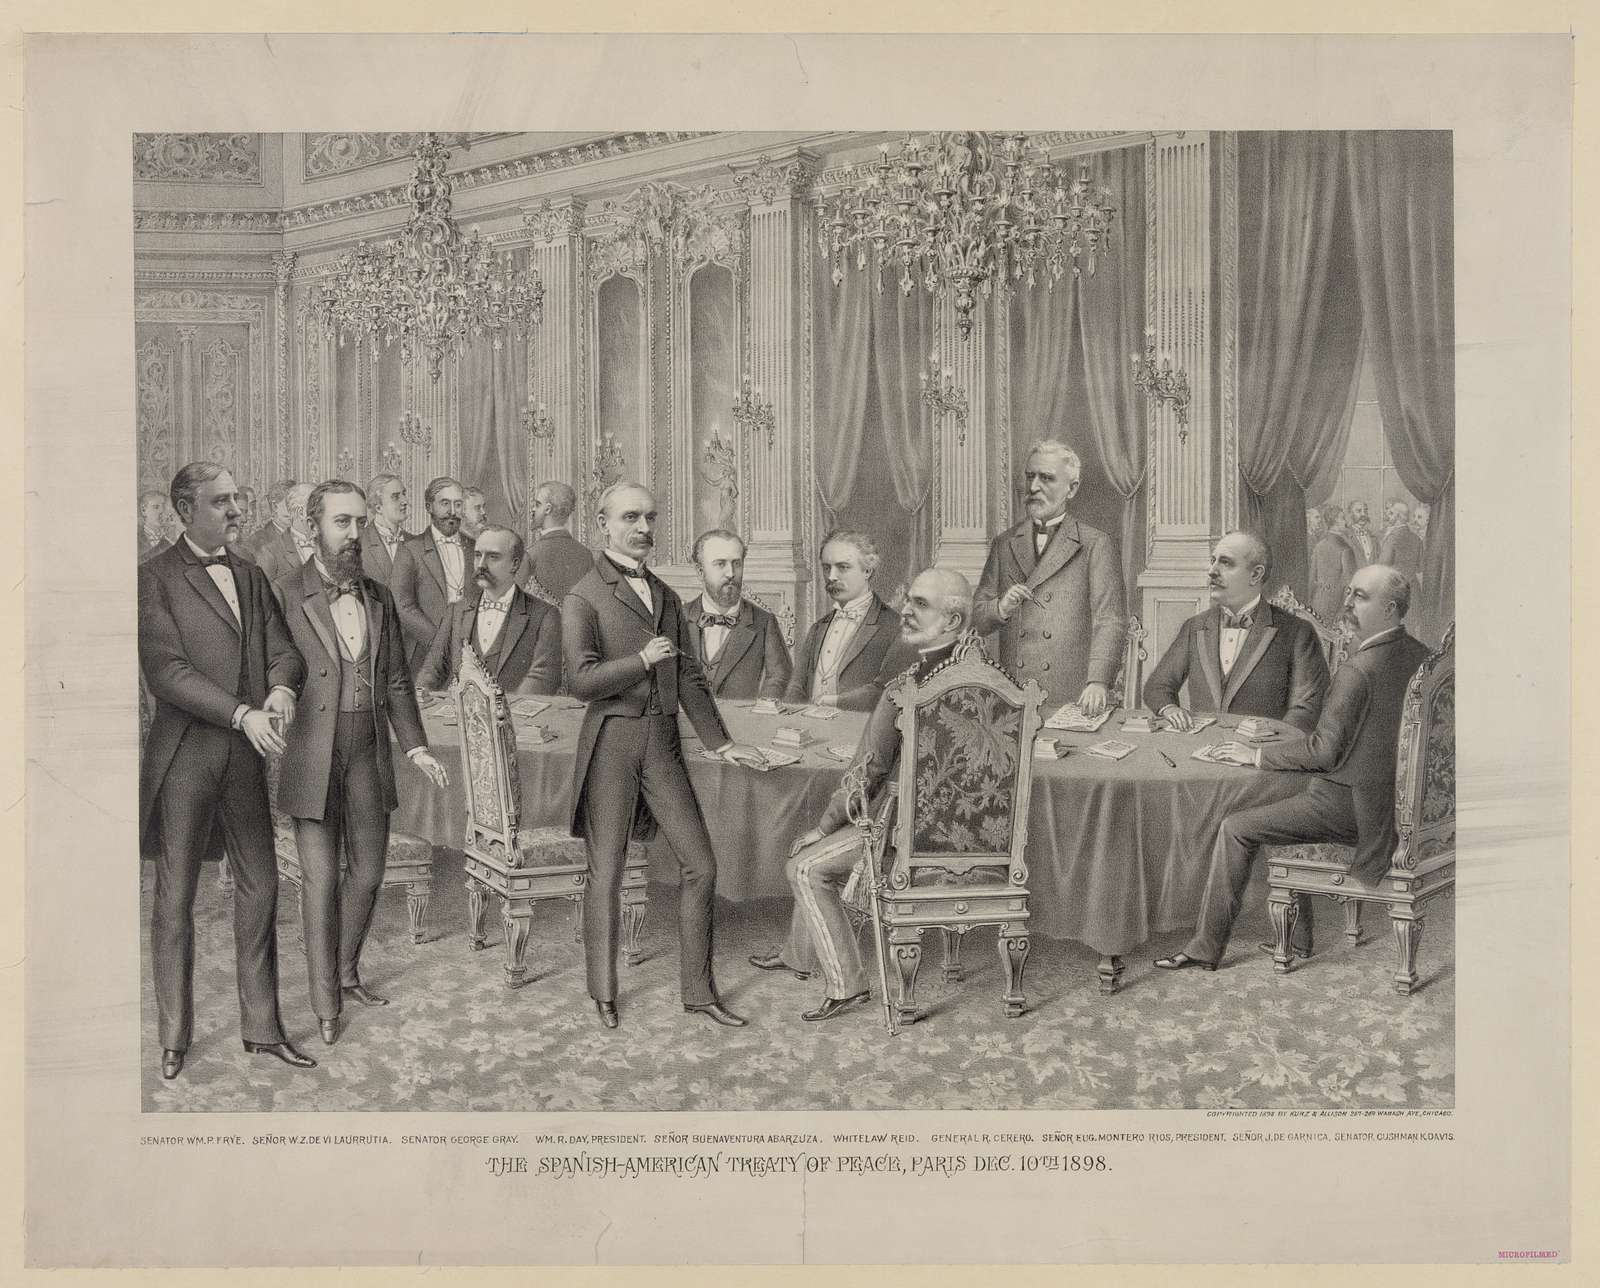 Spanish-American Treaty of Peace, Paris Dec. 10th 1898